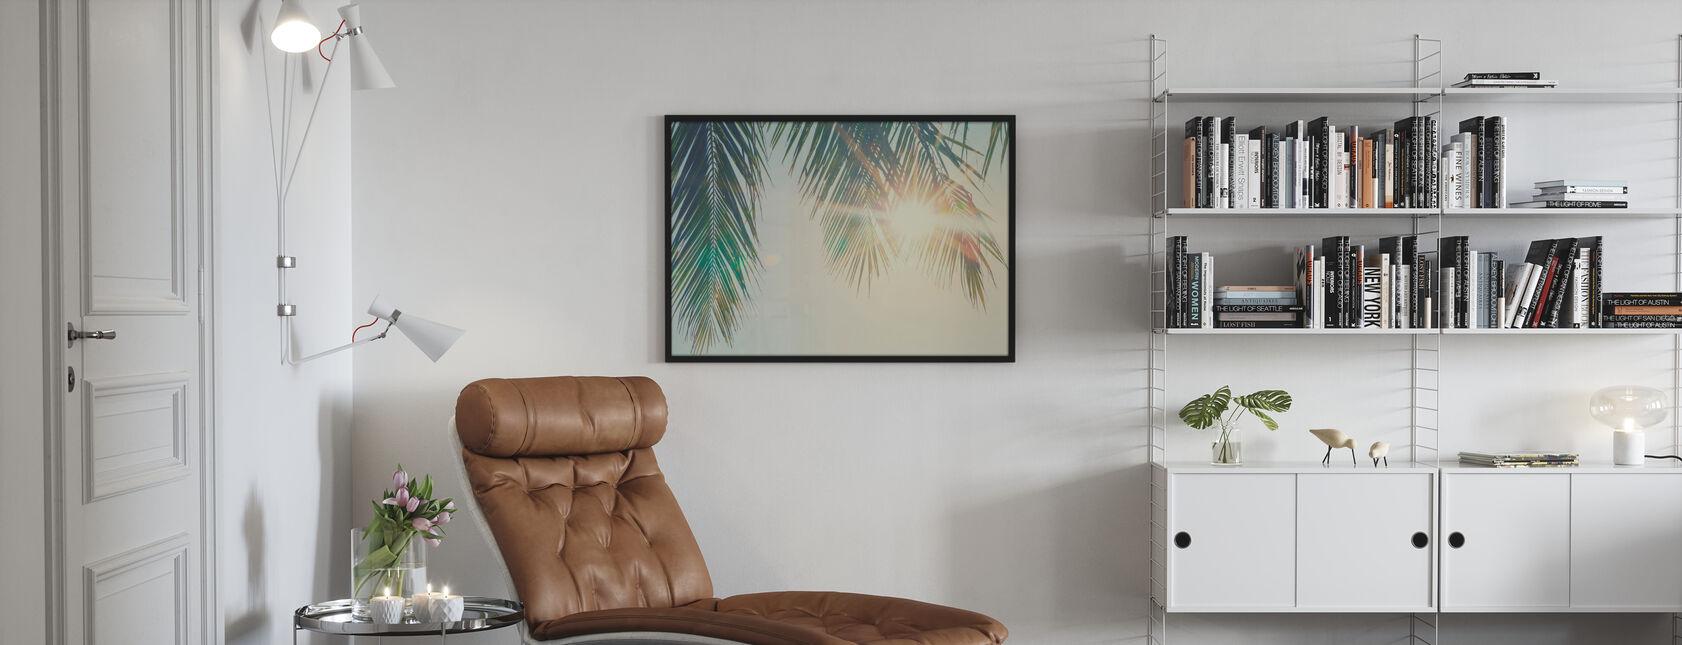 Palm Leaves Sunset - Poster - Living Room